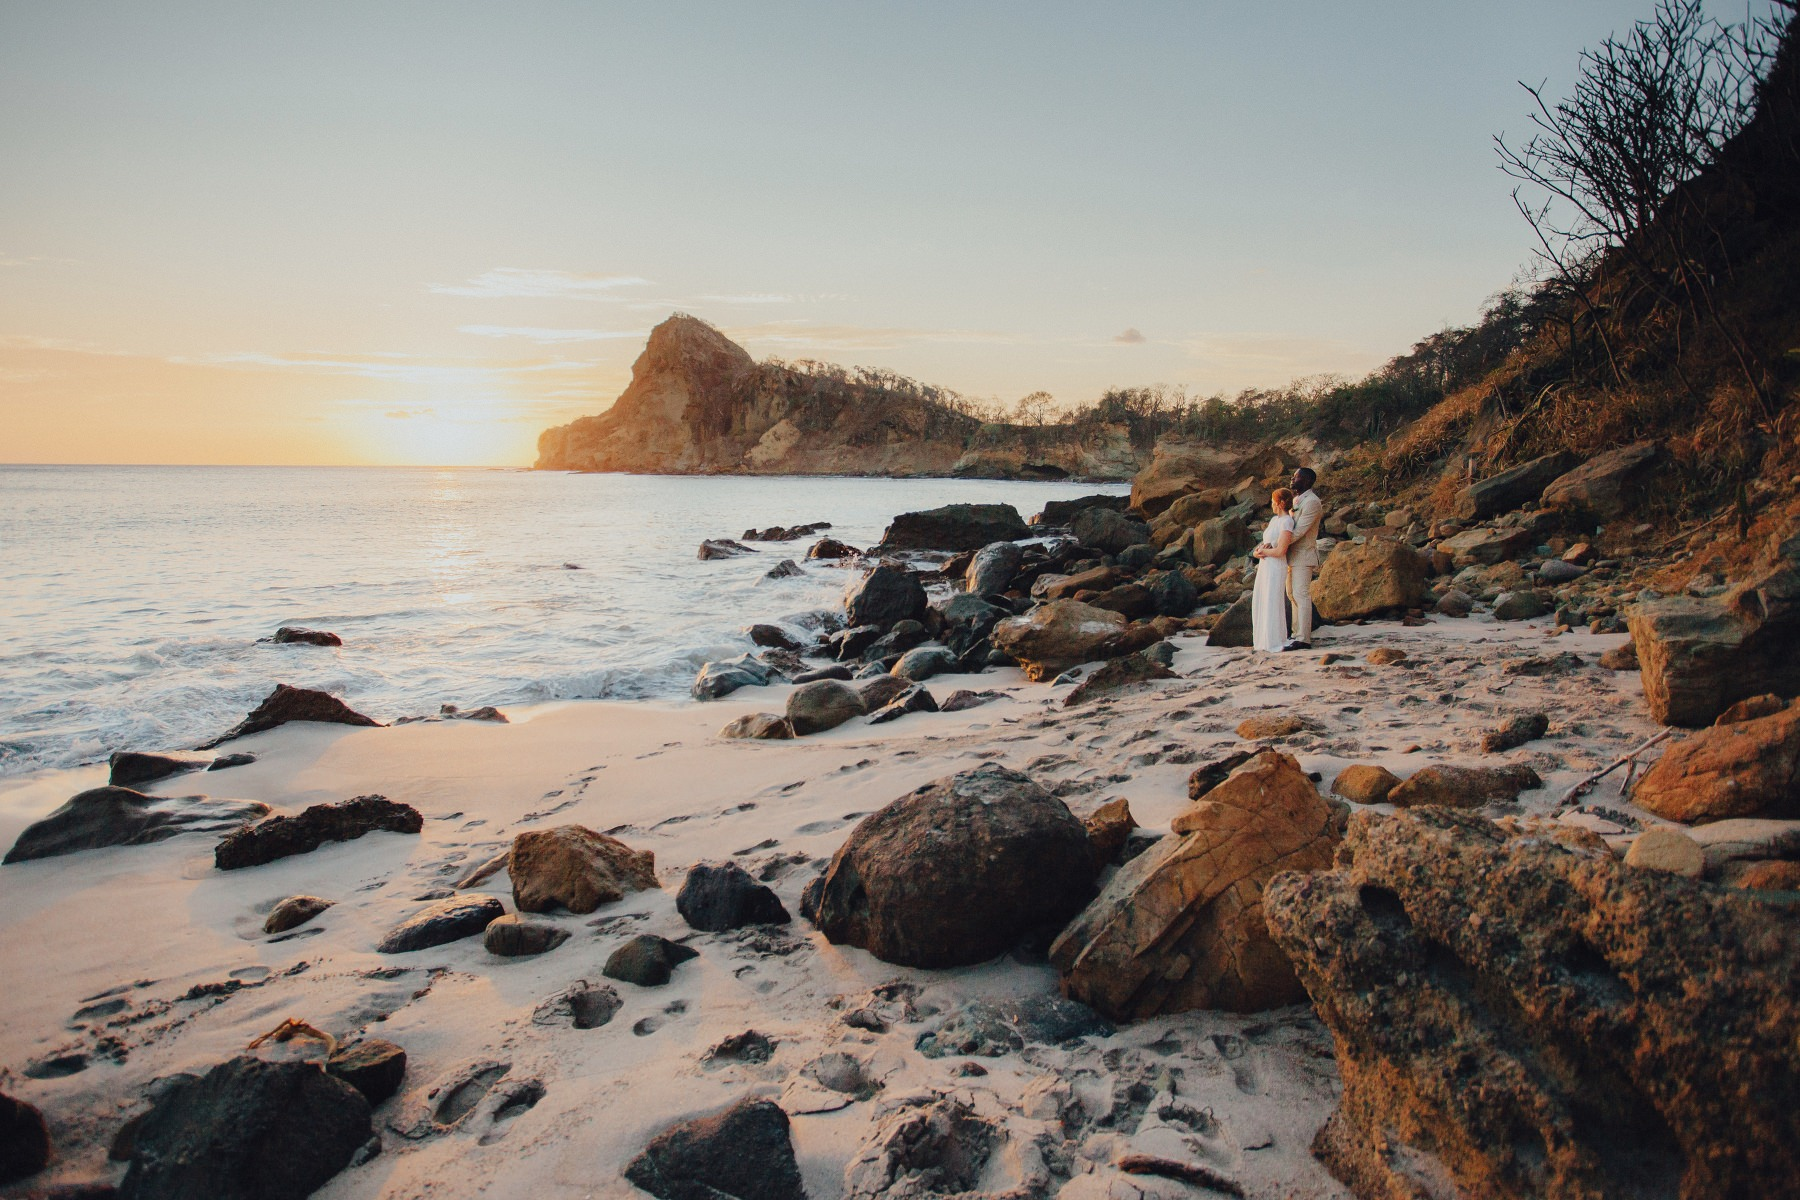 Beach wedding Venue in Nicaragua. Aqua resort at Redonda Bay - Tola. Elopement wedding of Magan and Aquil